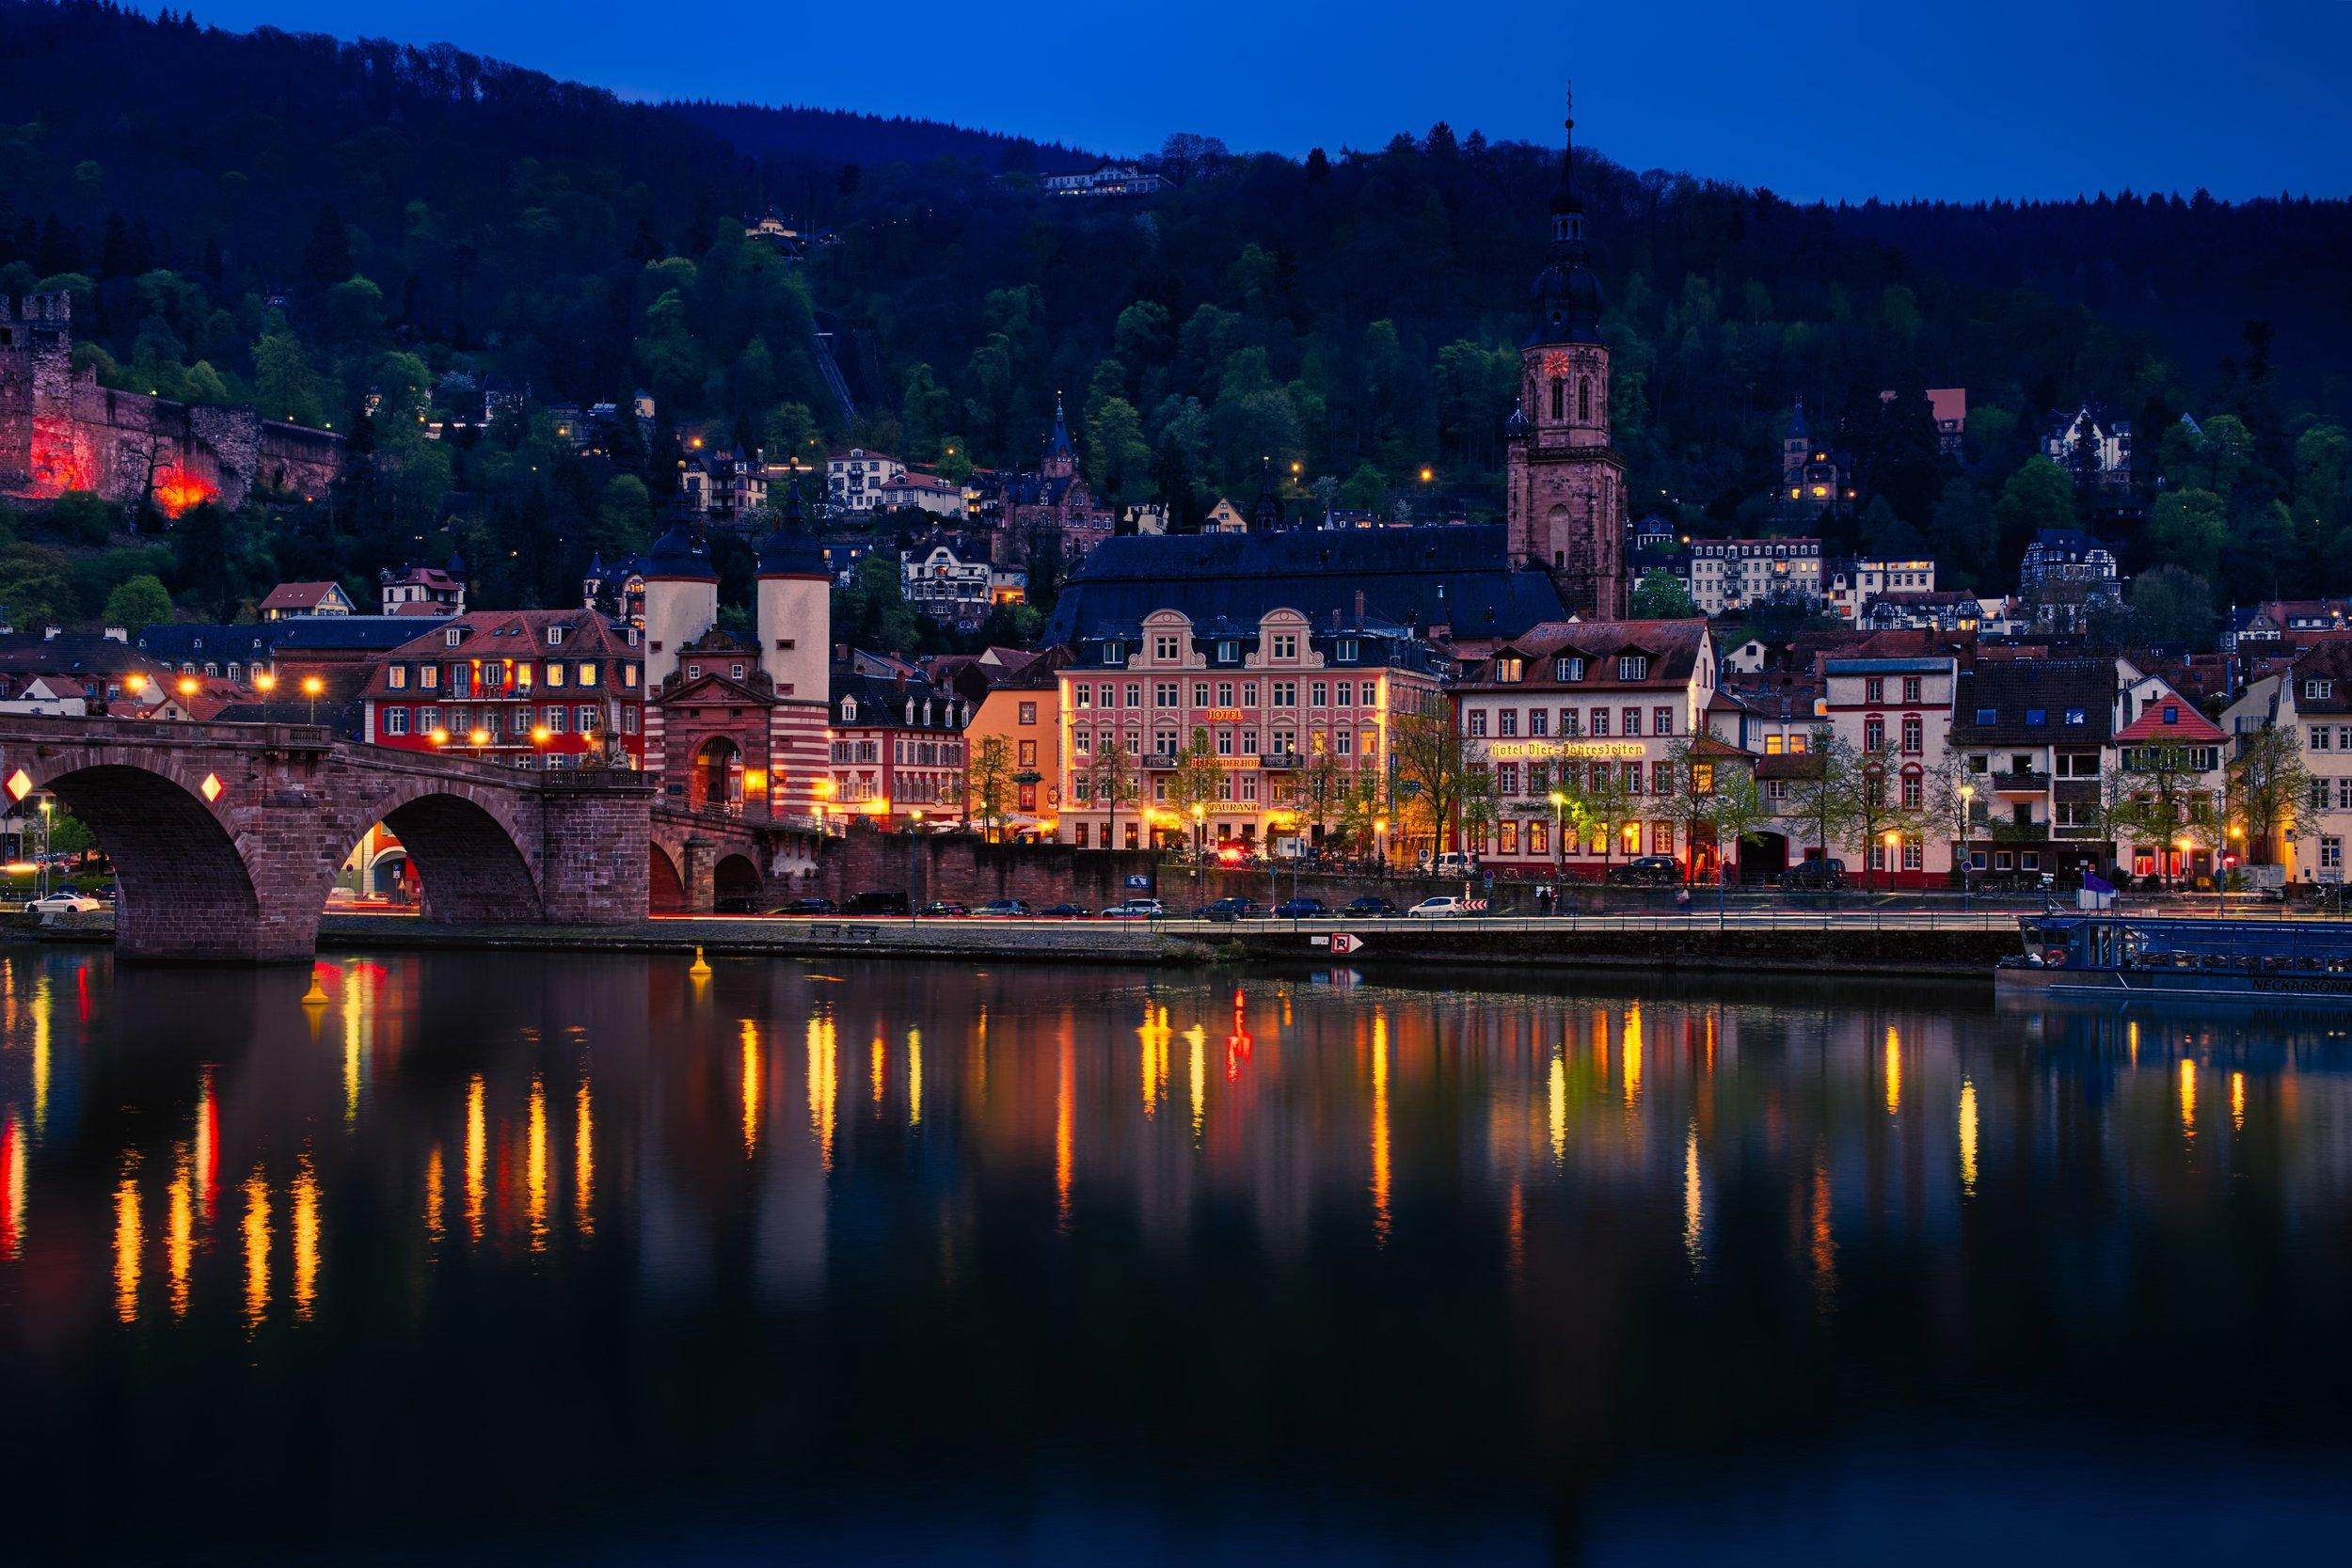 Germany-Heidelberg-bh-final1.jpeg